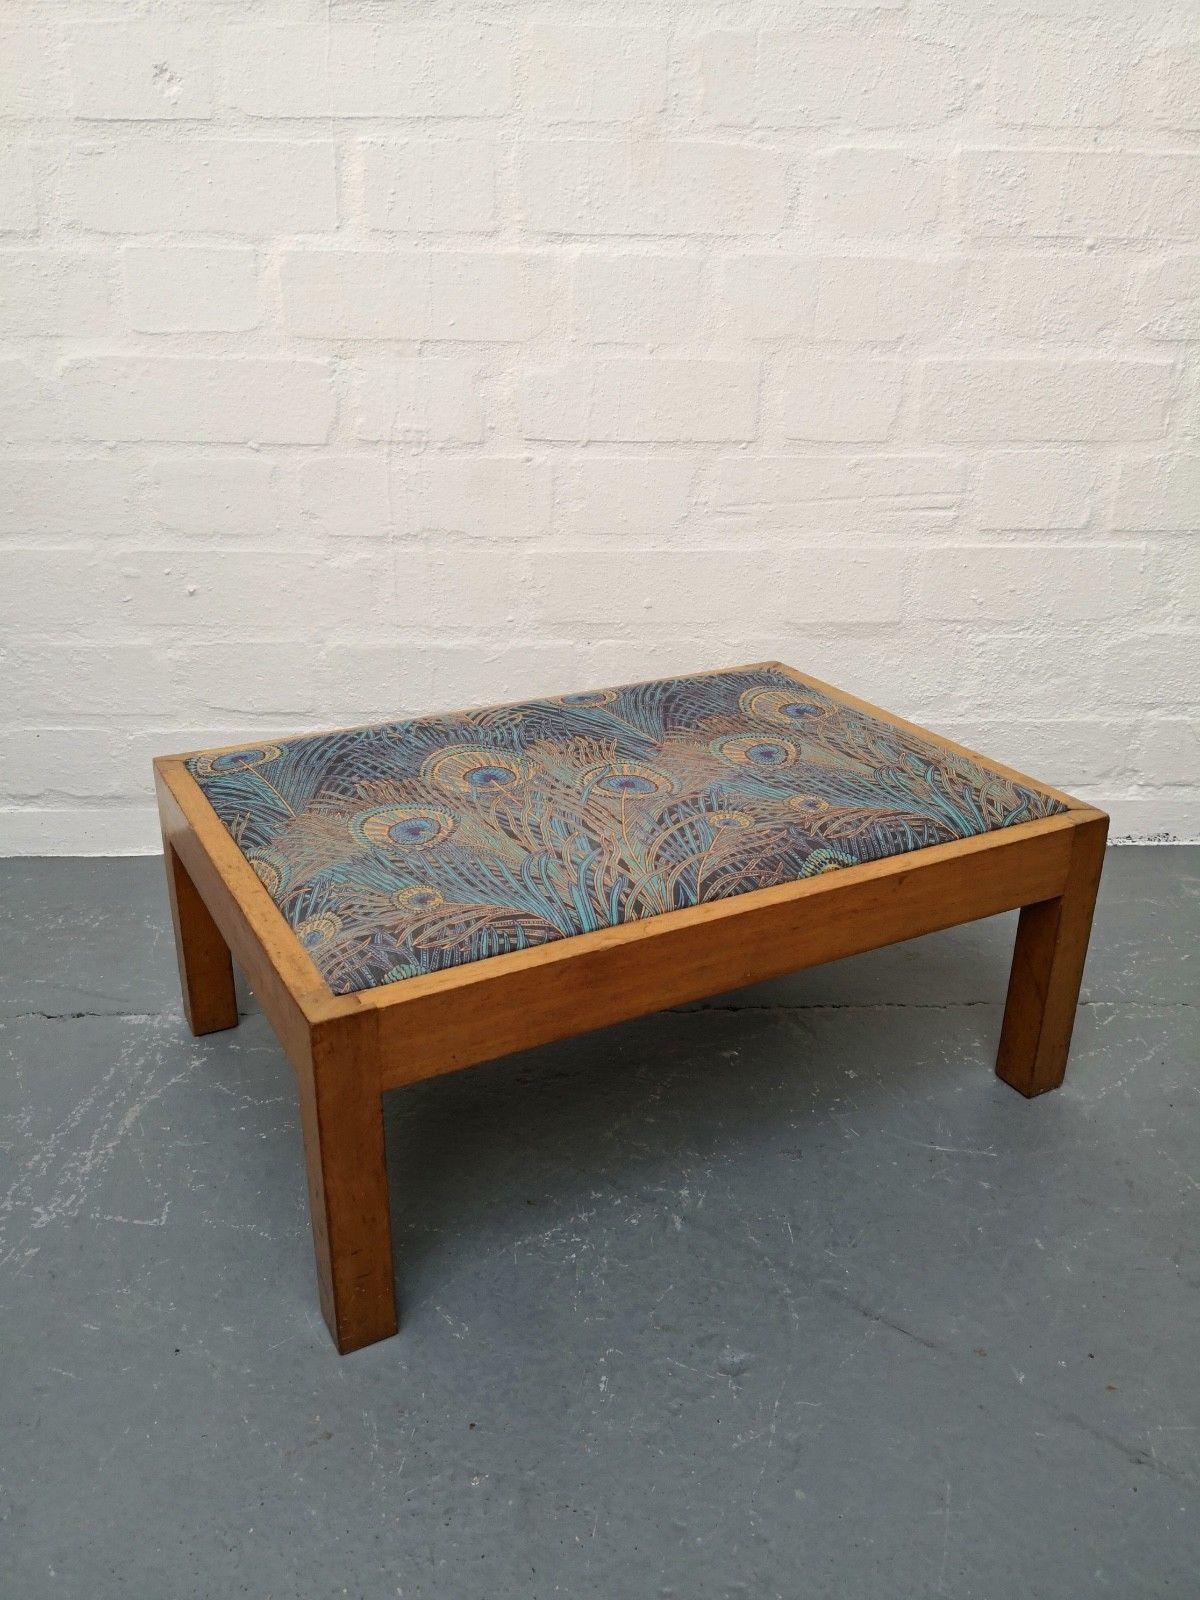 vintage-mid-century-peacock-liberty-print-foot-stool-ottoman